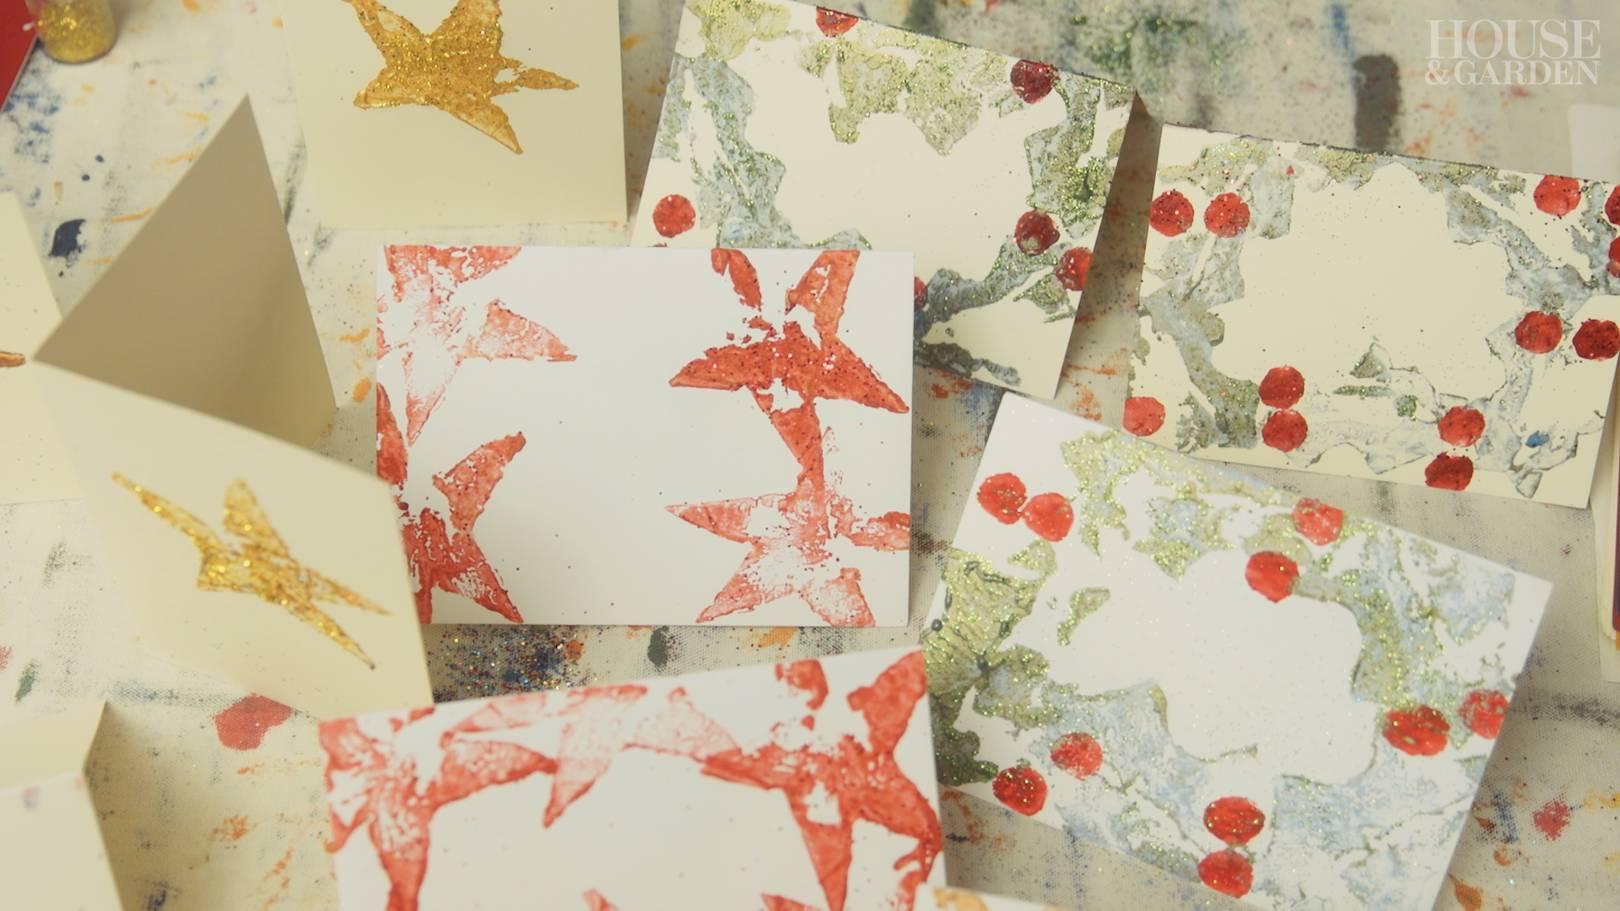 Maude makes: potato-printed Christmas cards